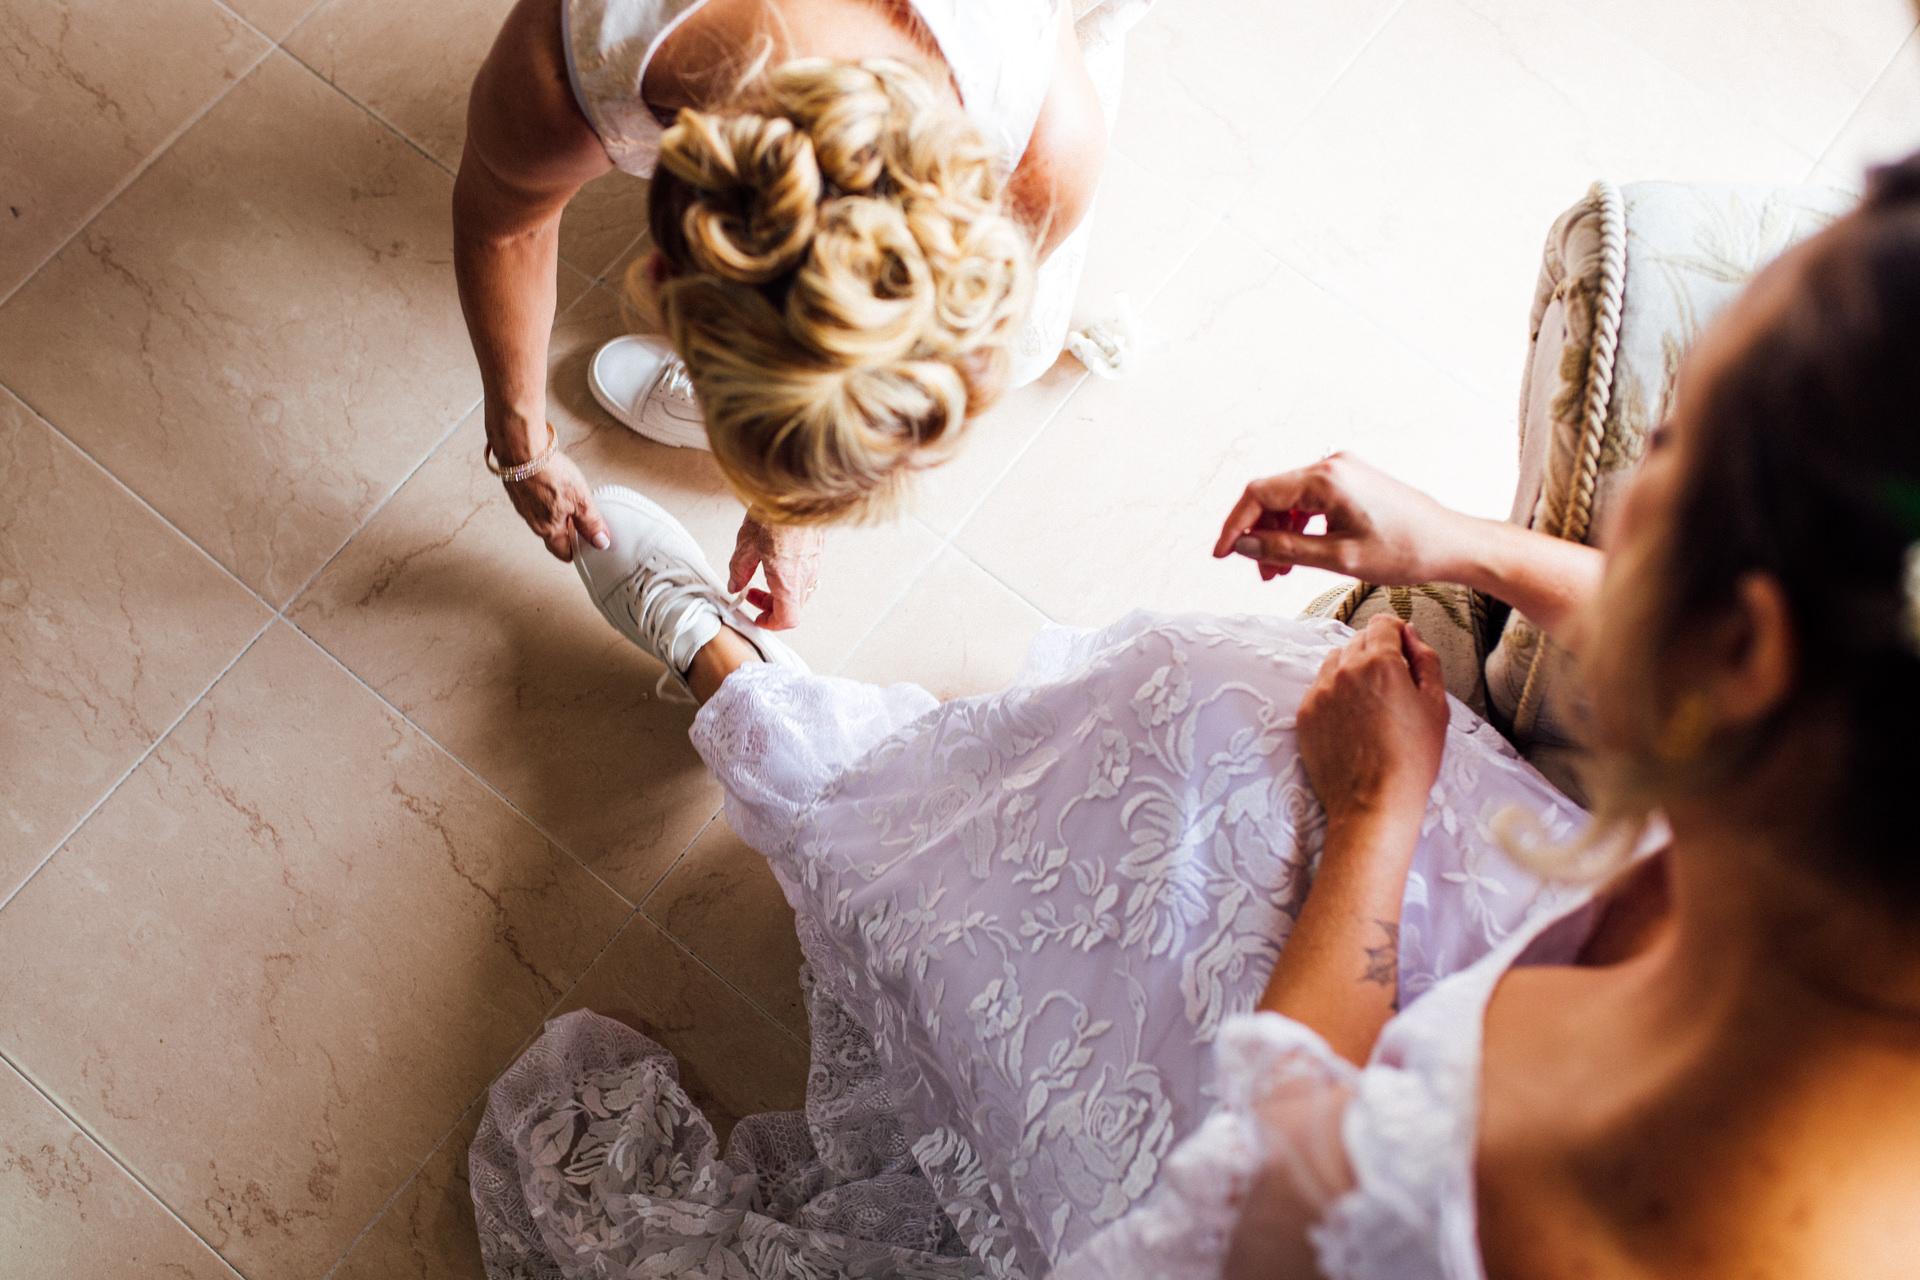 Wedding-Boda-Matrimonio-Fotografo-Fotografia-bodas-Medellin-Llanogrande-Colombia-Bogota-Cartagena-Miami-Wed-Destination-Photojournalism (41).JPG